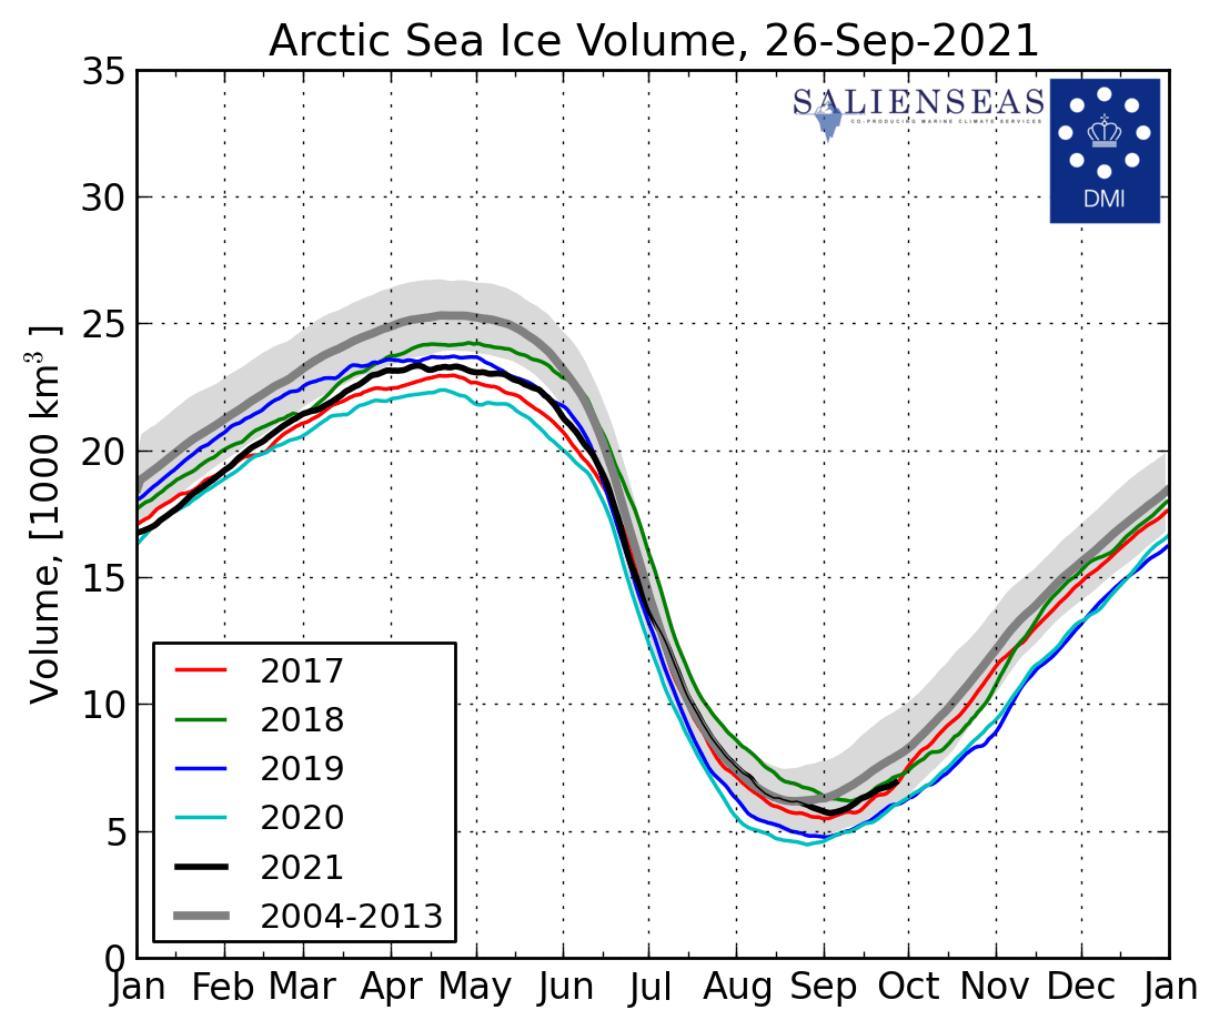 arctic-circle-sea-ice-volume-analysis-graph-2021